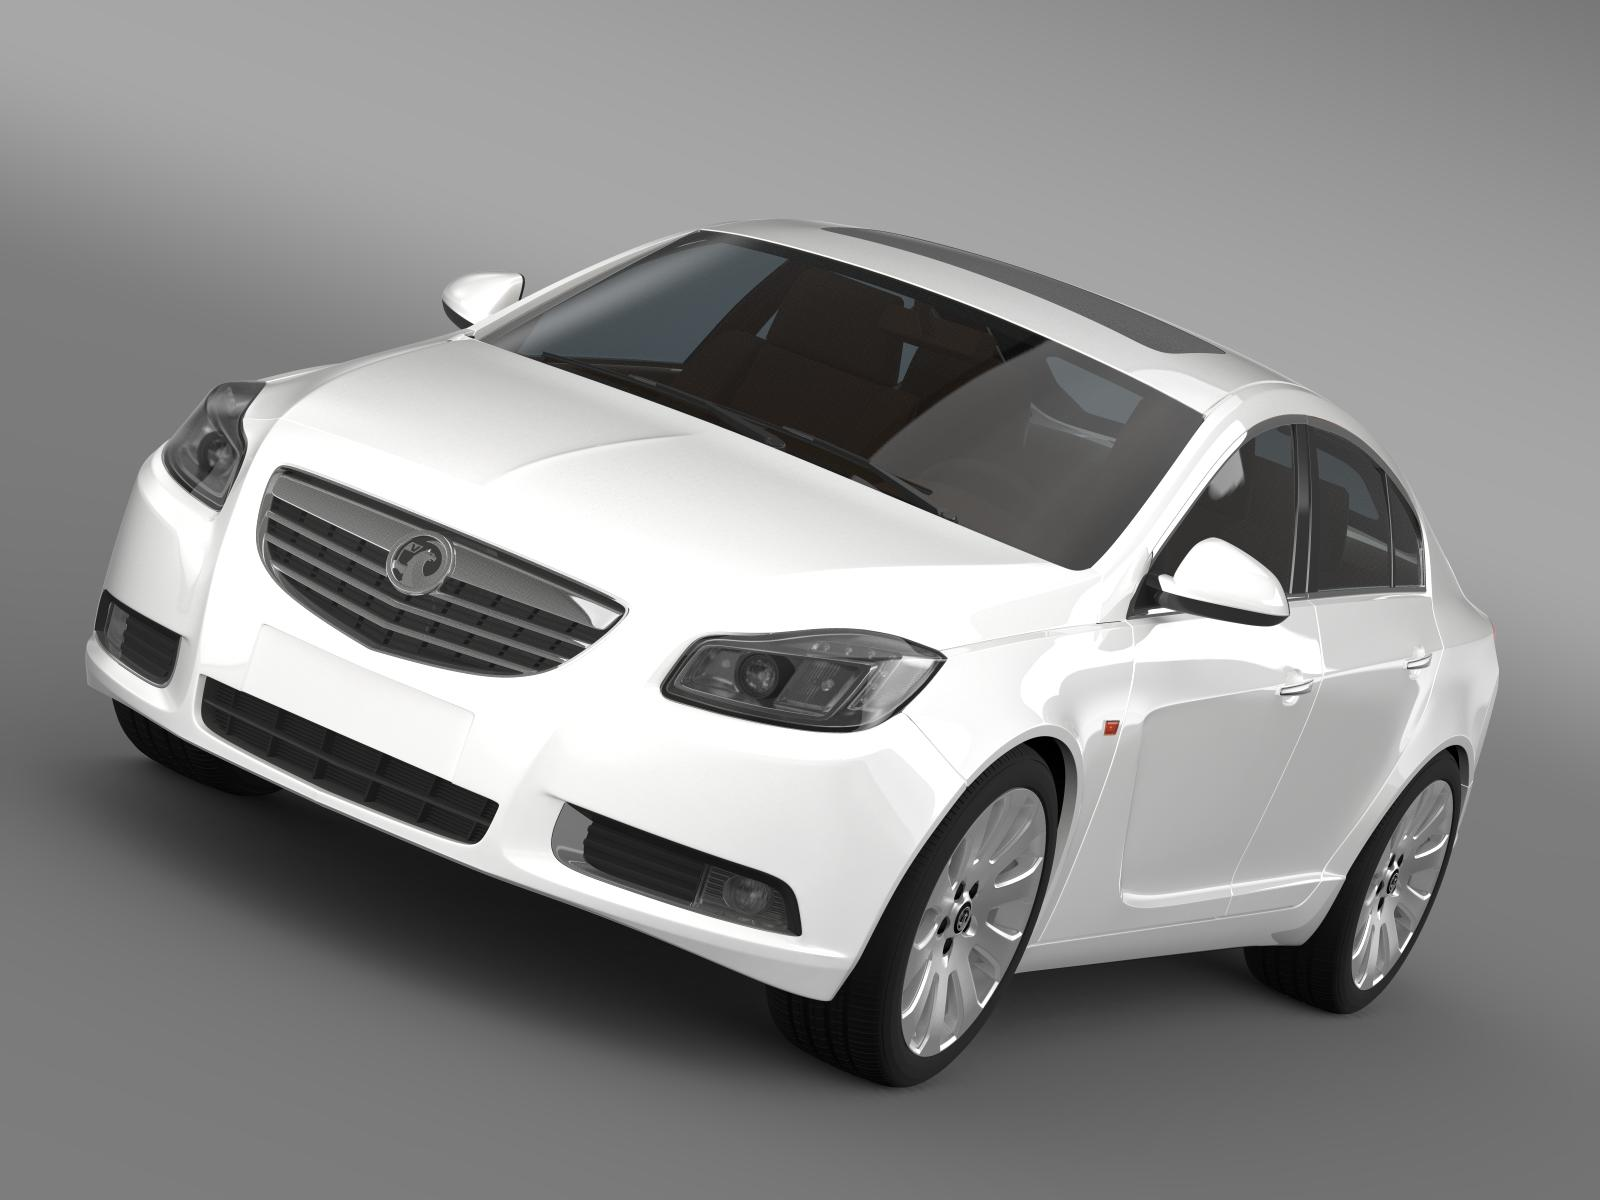 vauxhall insignia hatchback 2009-2013 3d model 3ds max fbx c4d lwo ma mb hrc xsi obj 165533